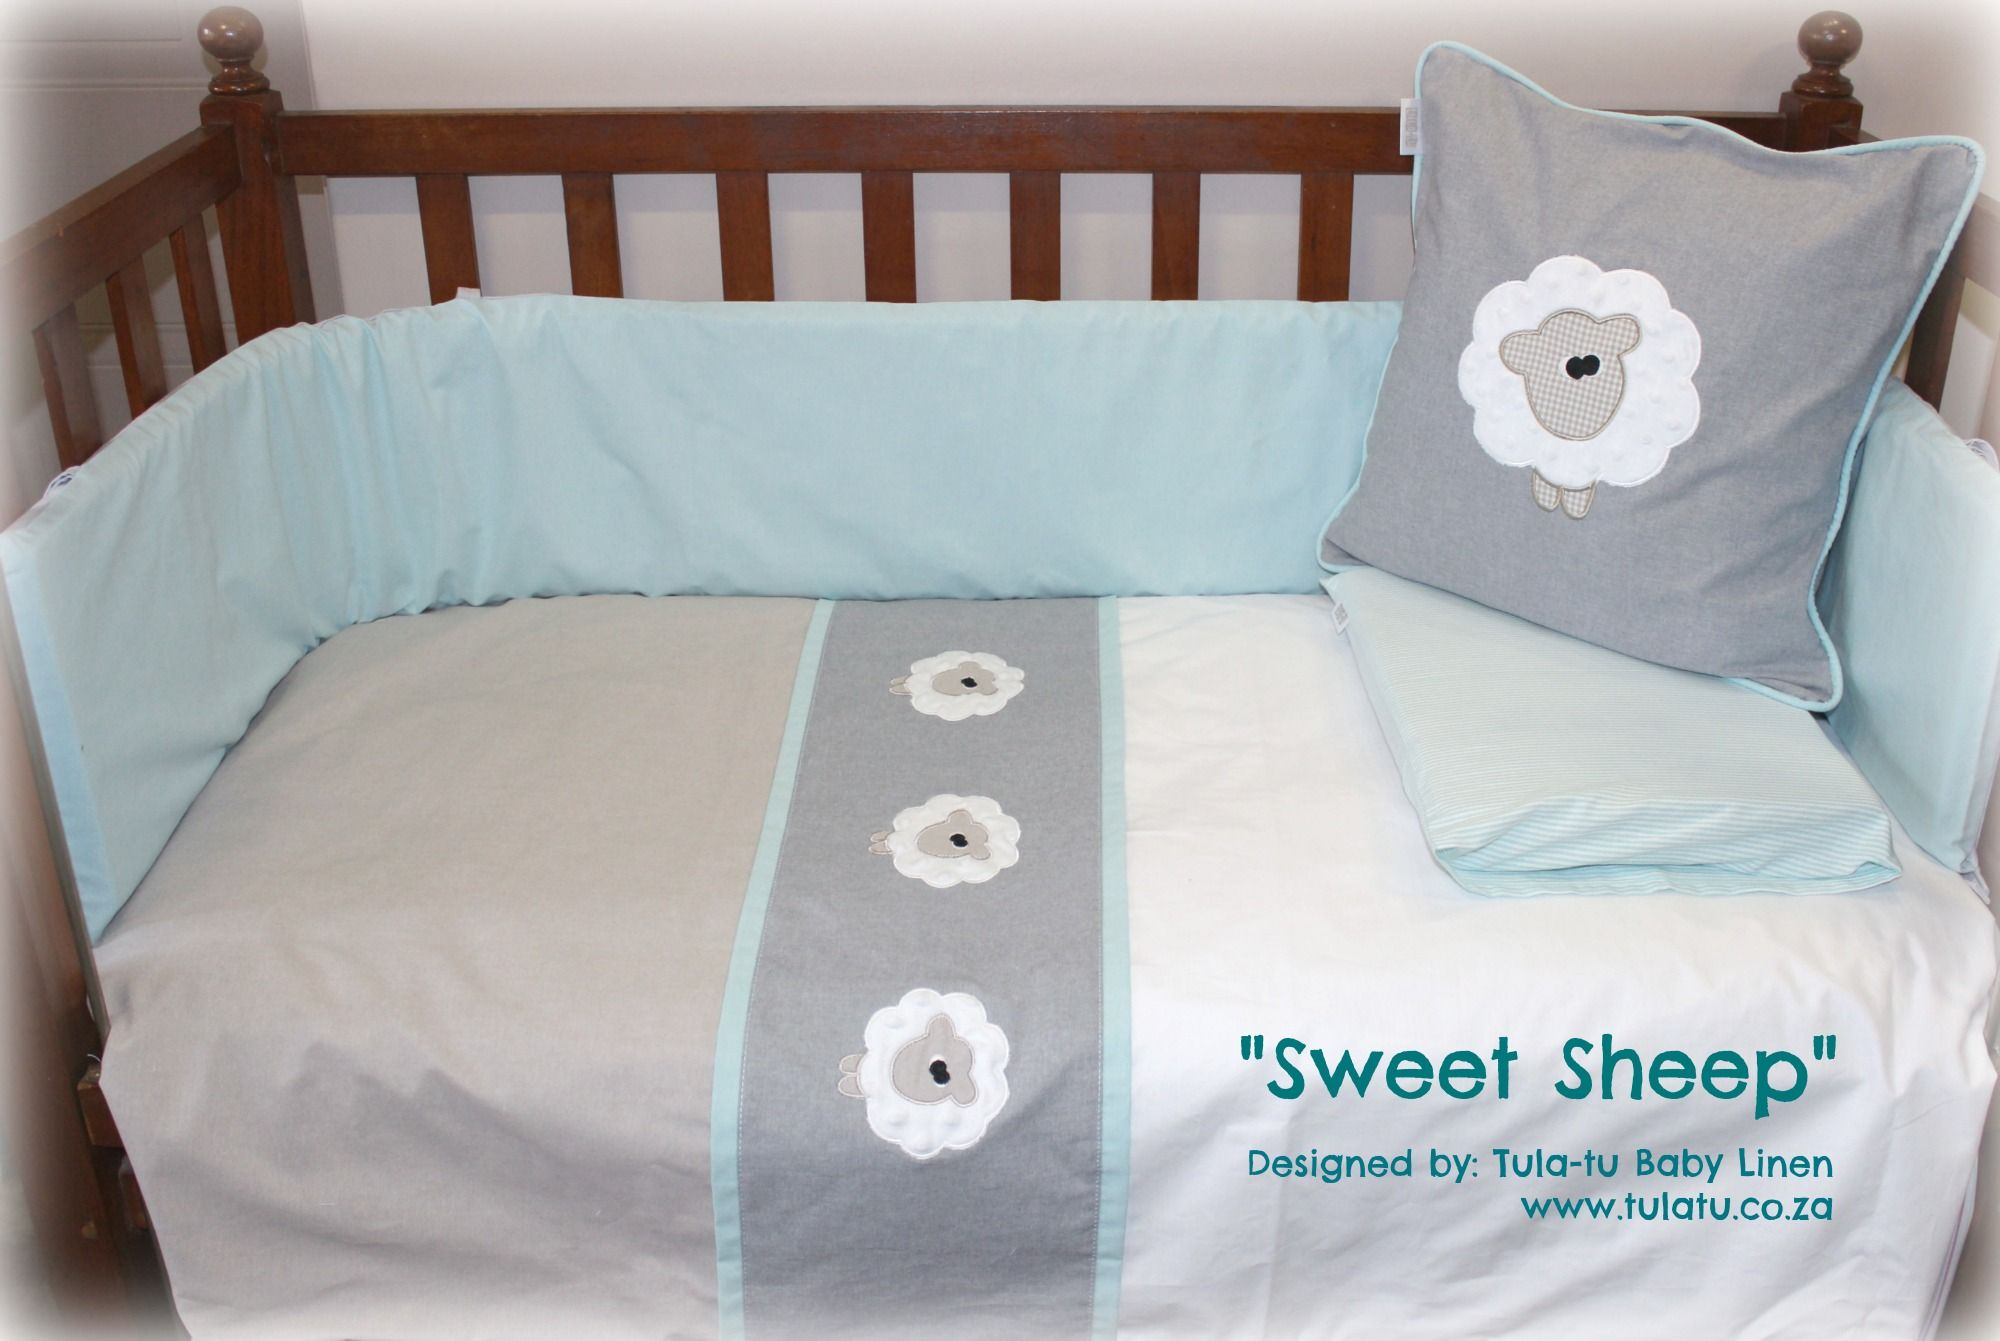 Baby cribs co za -  Sweet Sheep Baby Linen Crib Linen Designed By Tula Tu Baby Linen